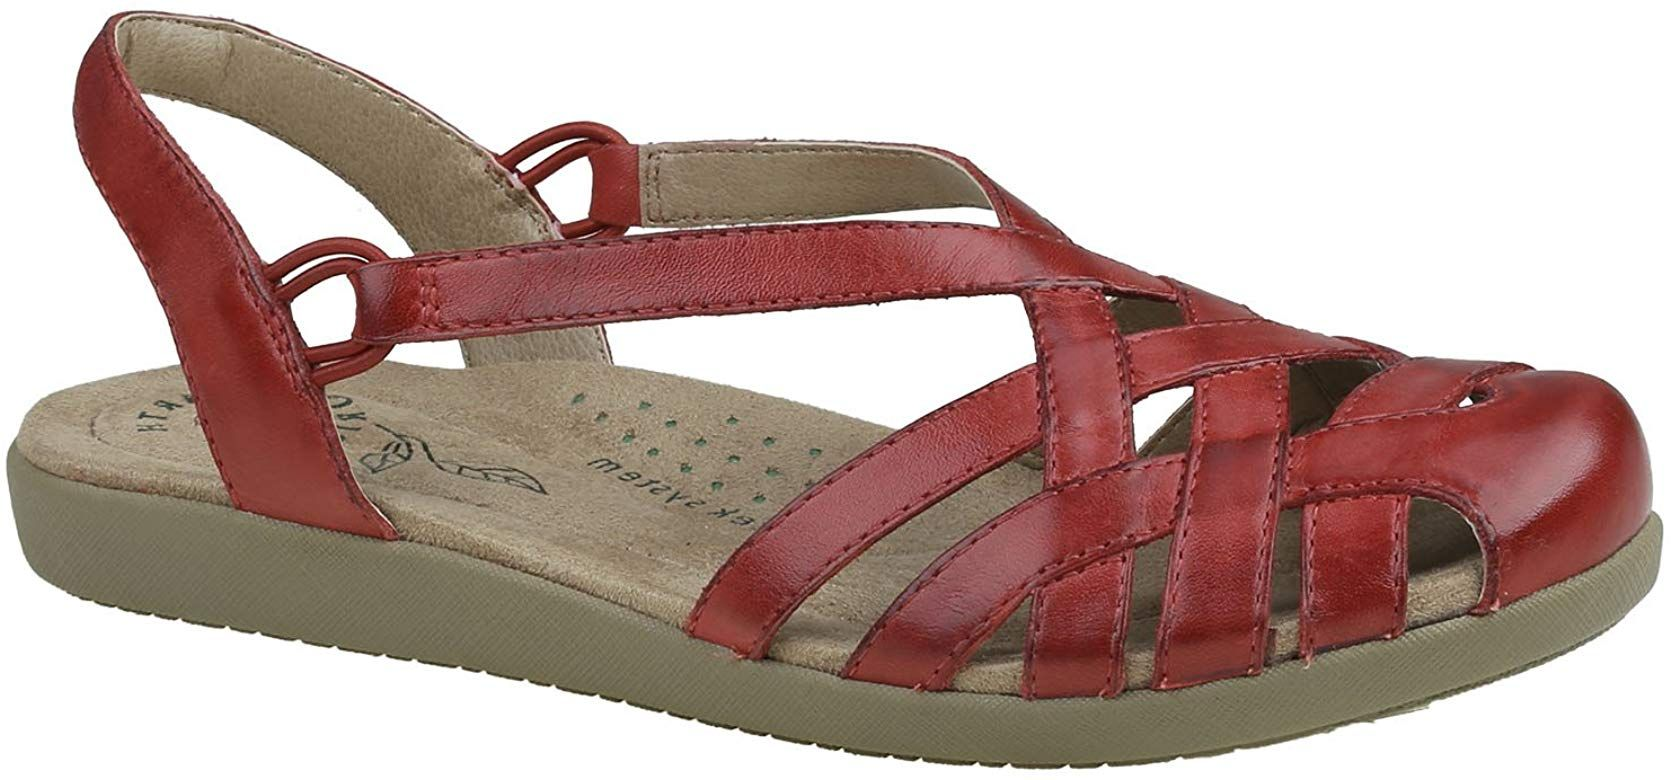 Nellie Sandal PARISAN Blue 9.5 N